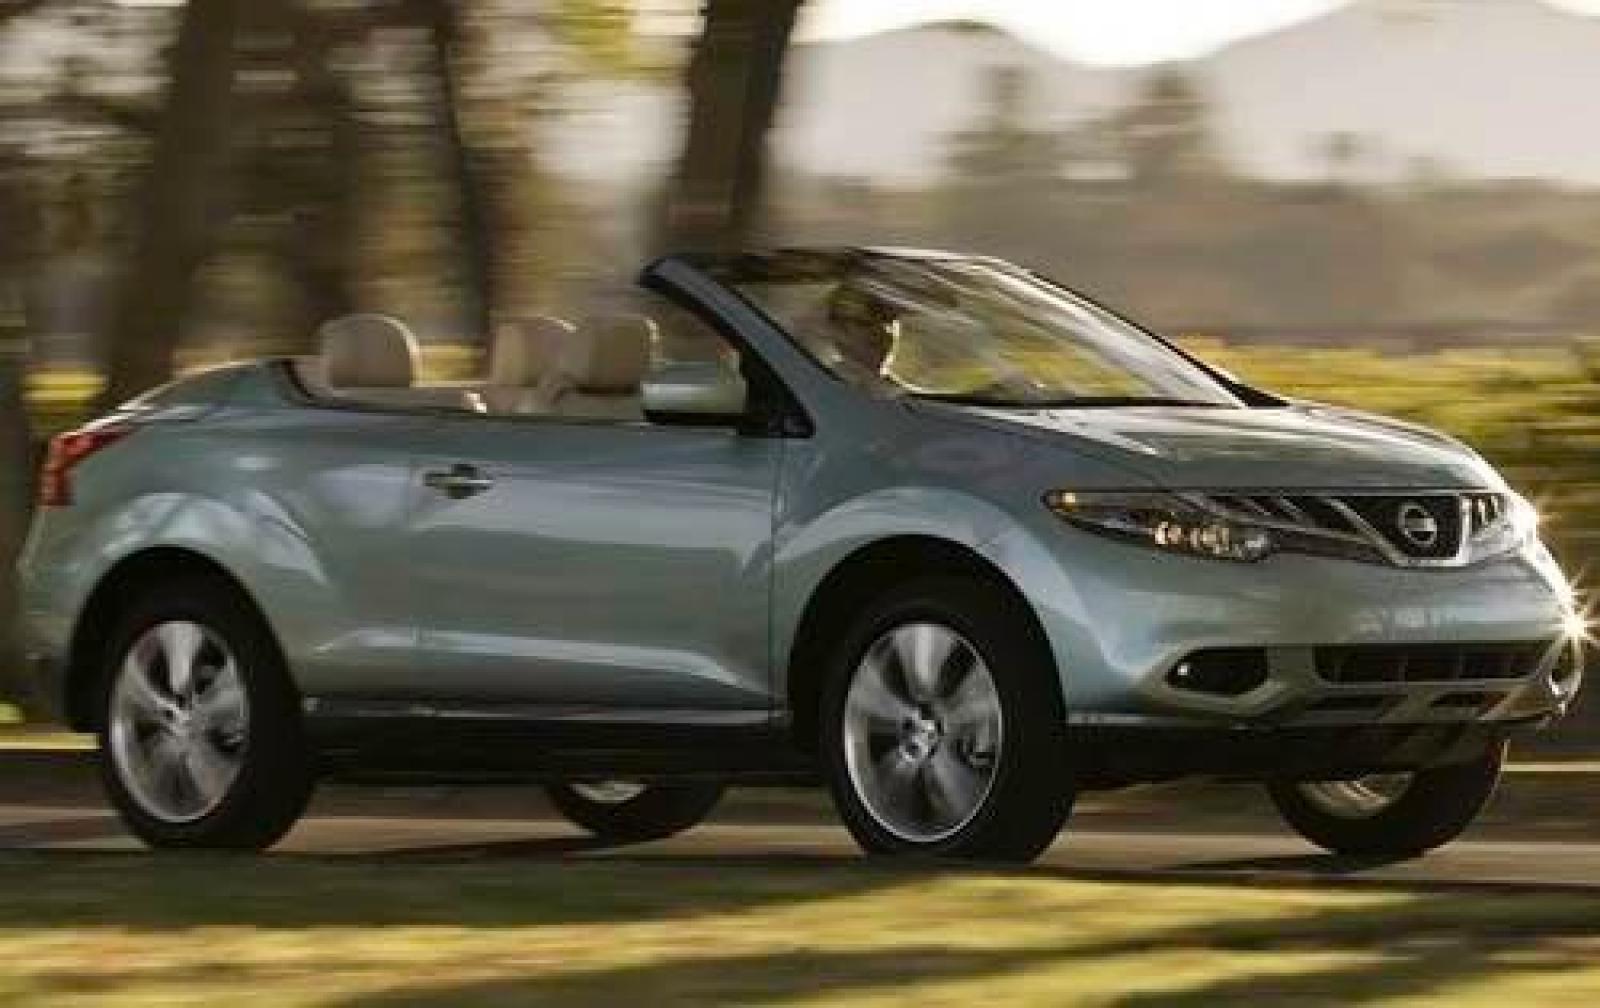 Delightful 2011 Nissan Murano CrossCabriolet #2